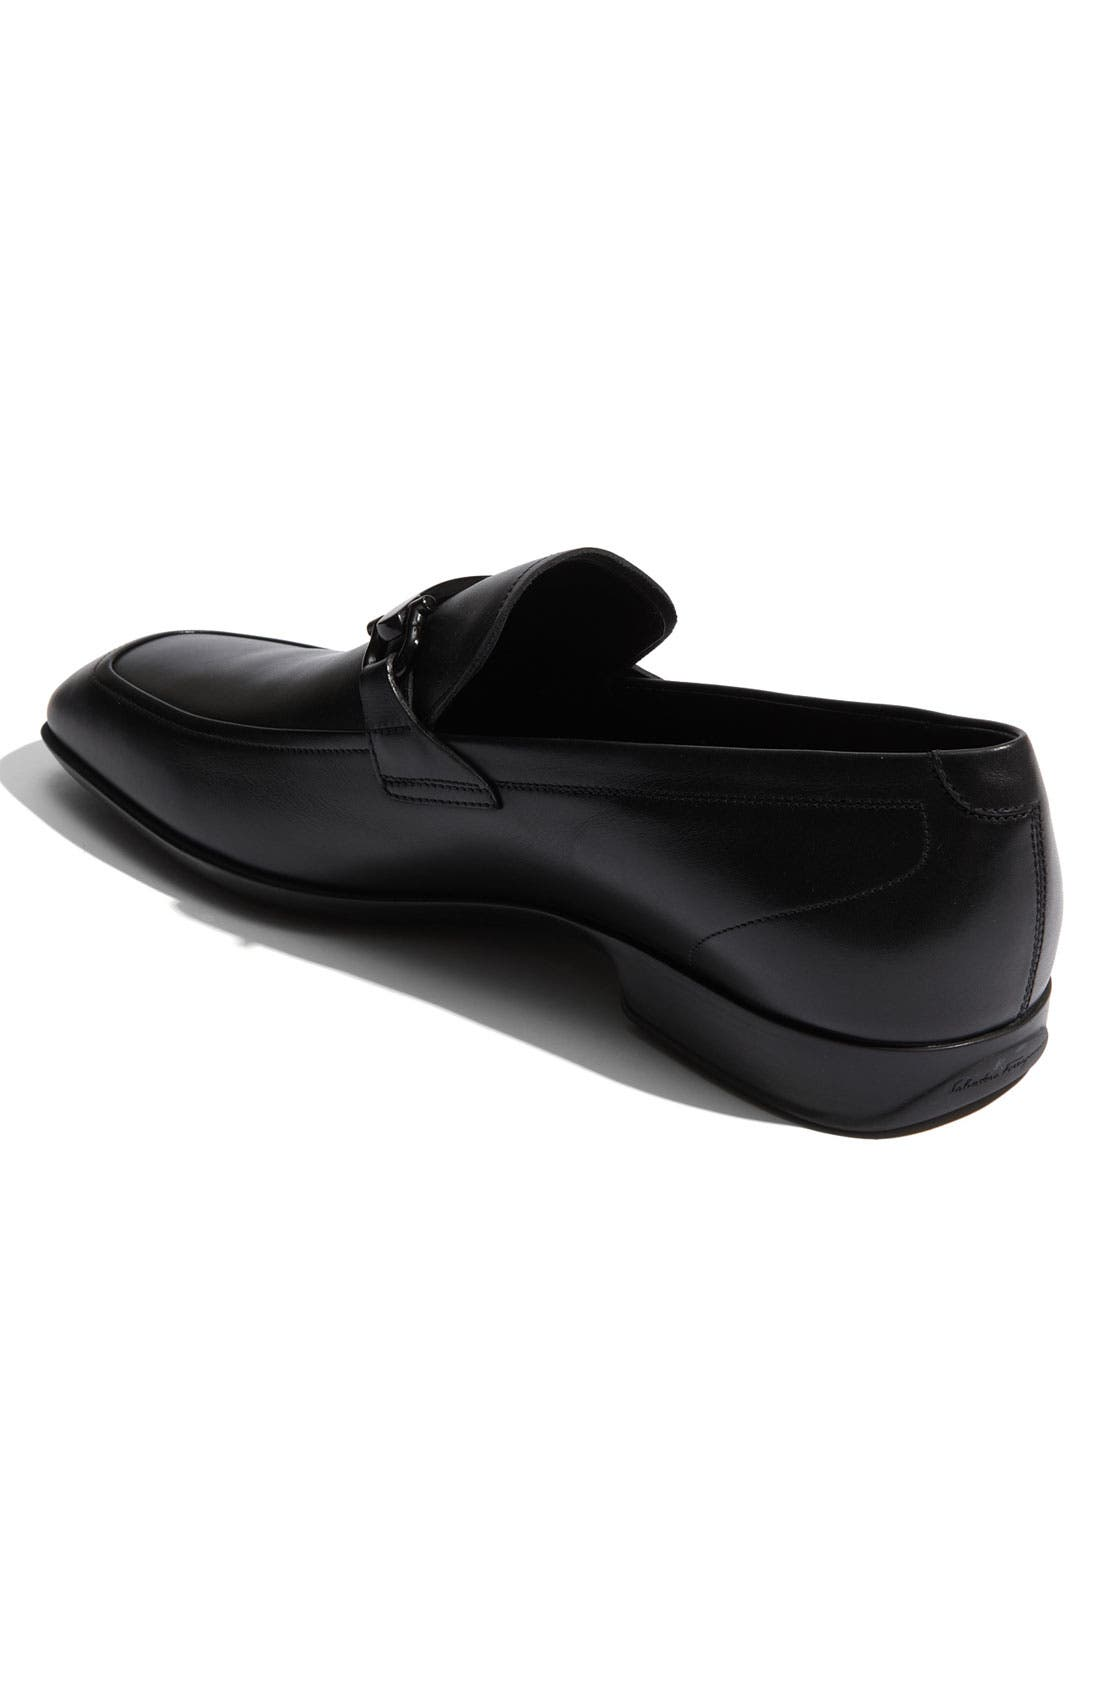 Alternate Image 2  - Salvatore Ferragamo 'Crown' Loafer